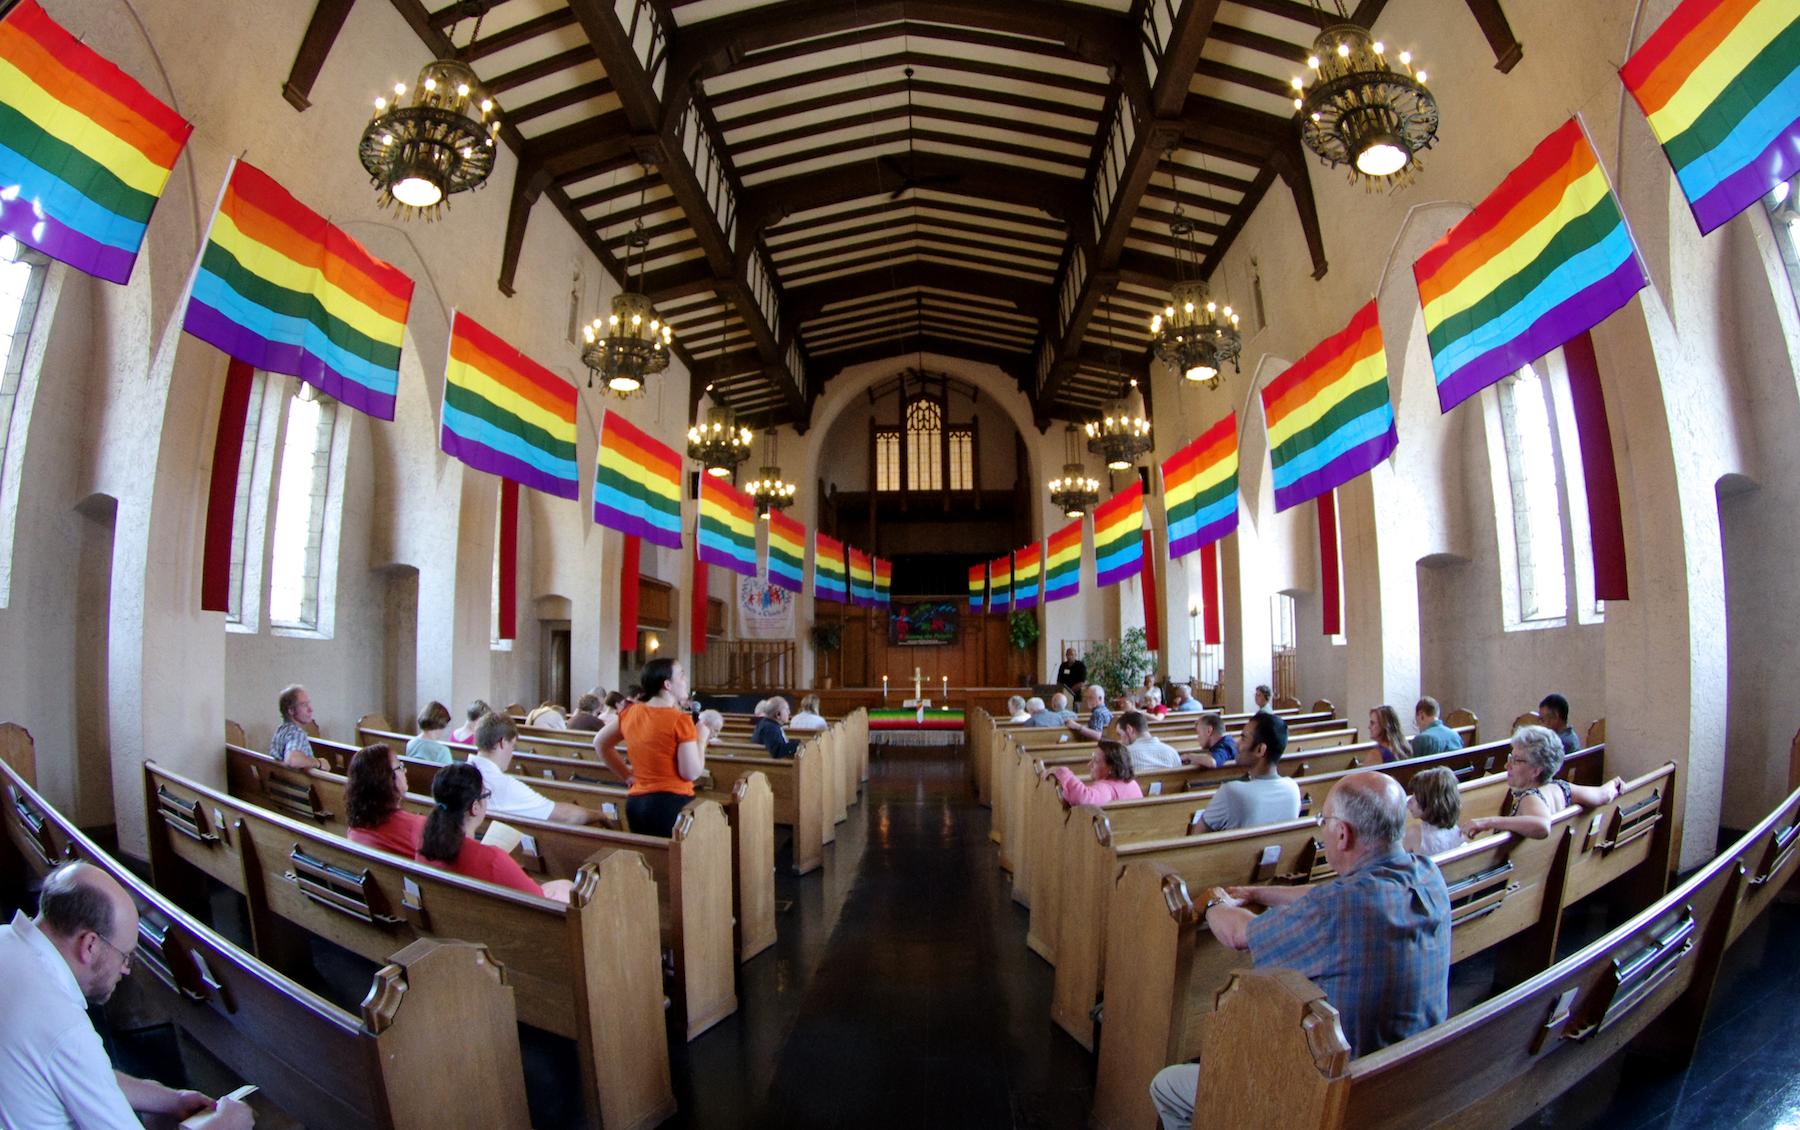 Rainbow-Church-Flags-University-Baptist-LGBTQ-By-Jim-Ross-2.png